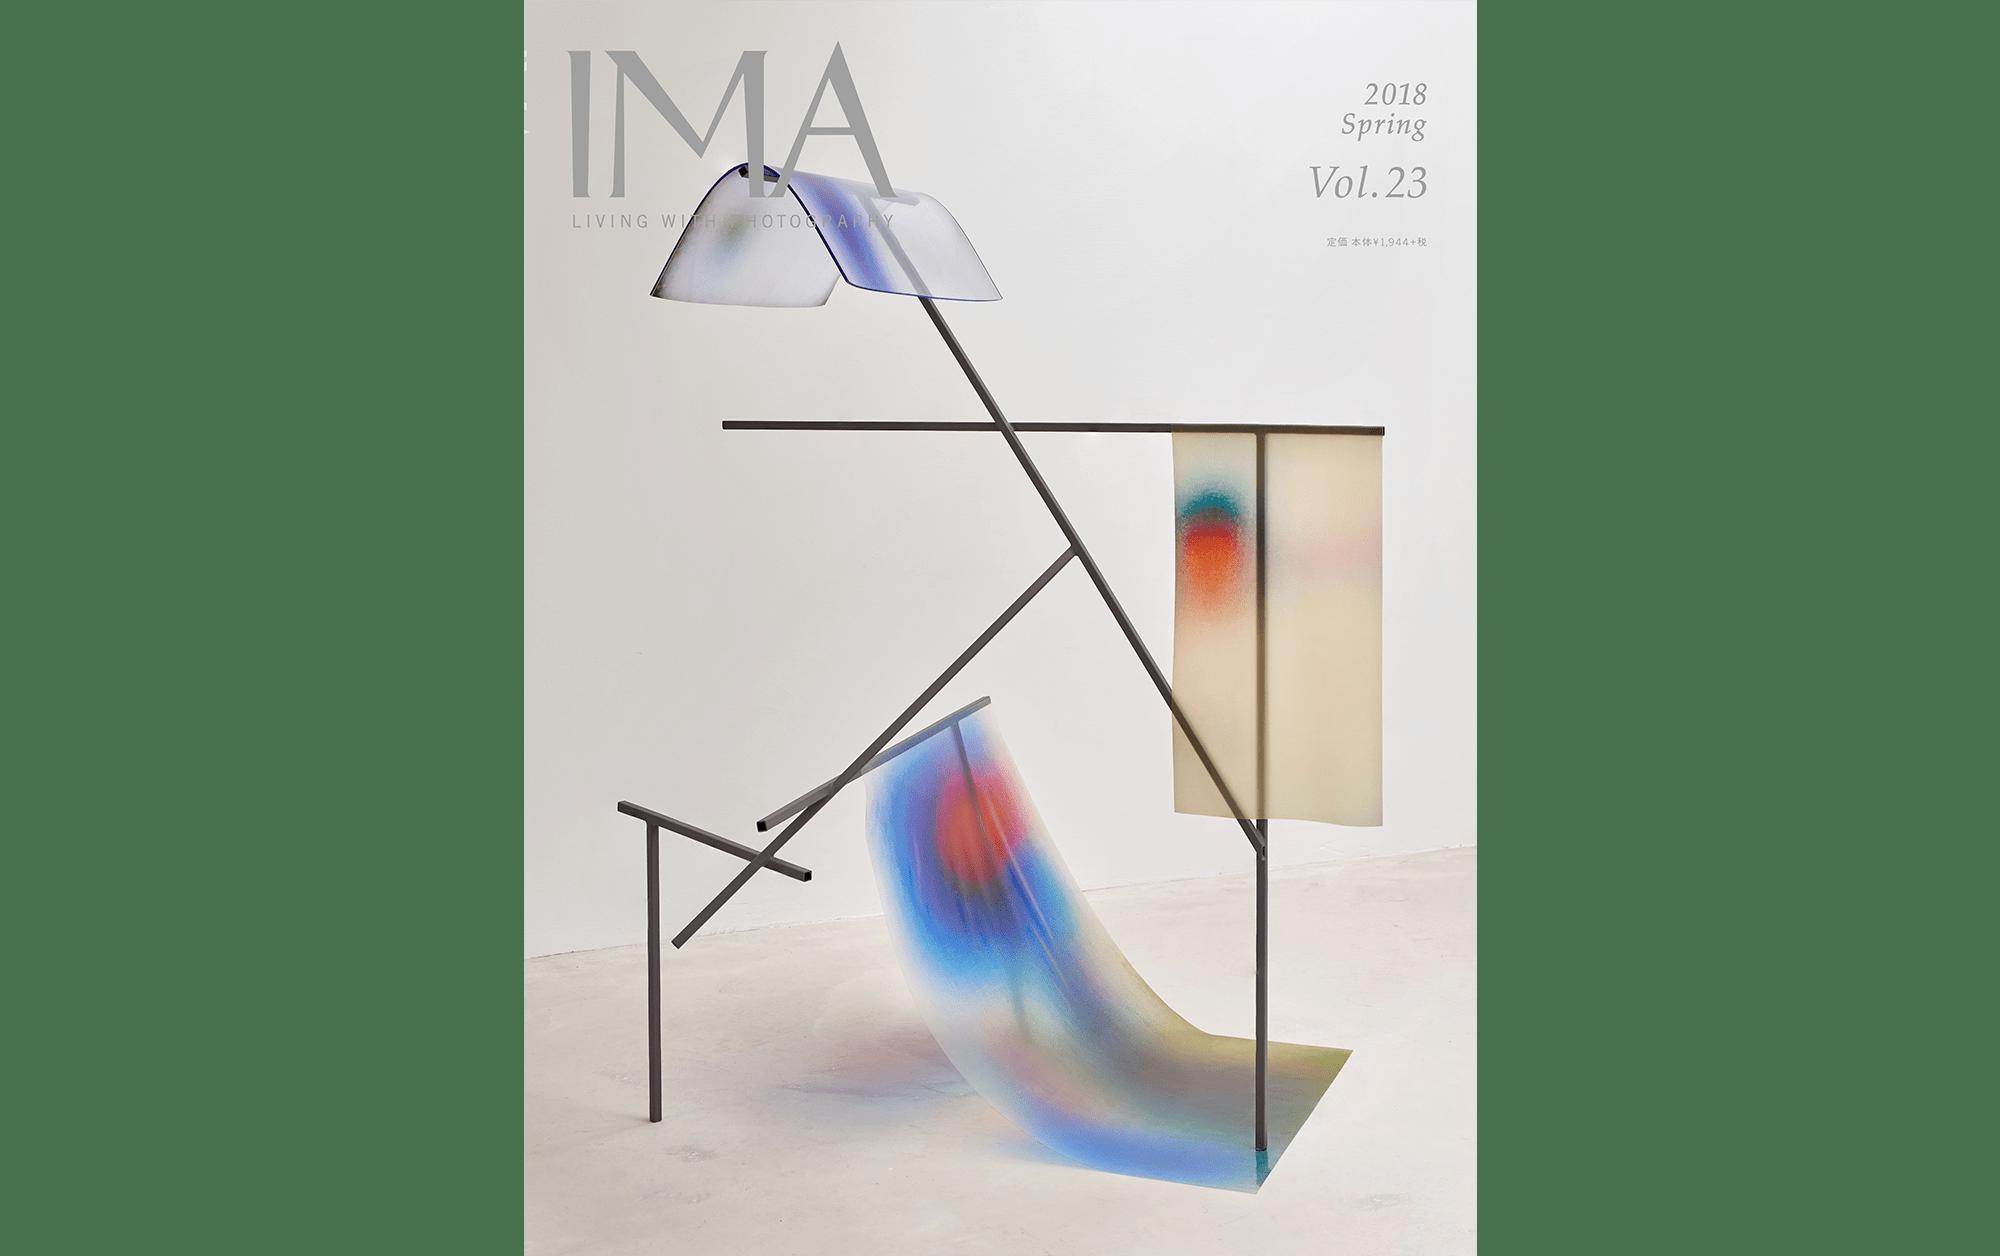 IMA 2017 Spring Vol.23 © Anouk Kruithof, Neutral (puzzled) sculpture Photo: Pim Top